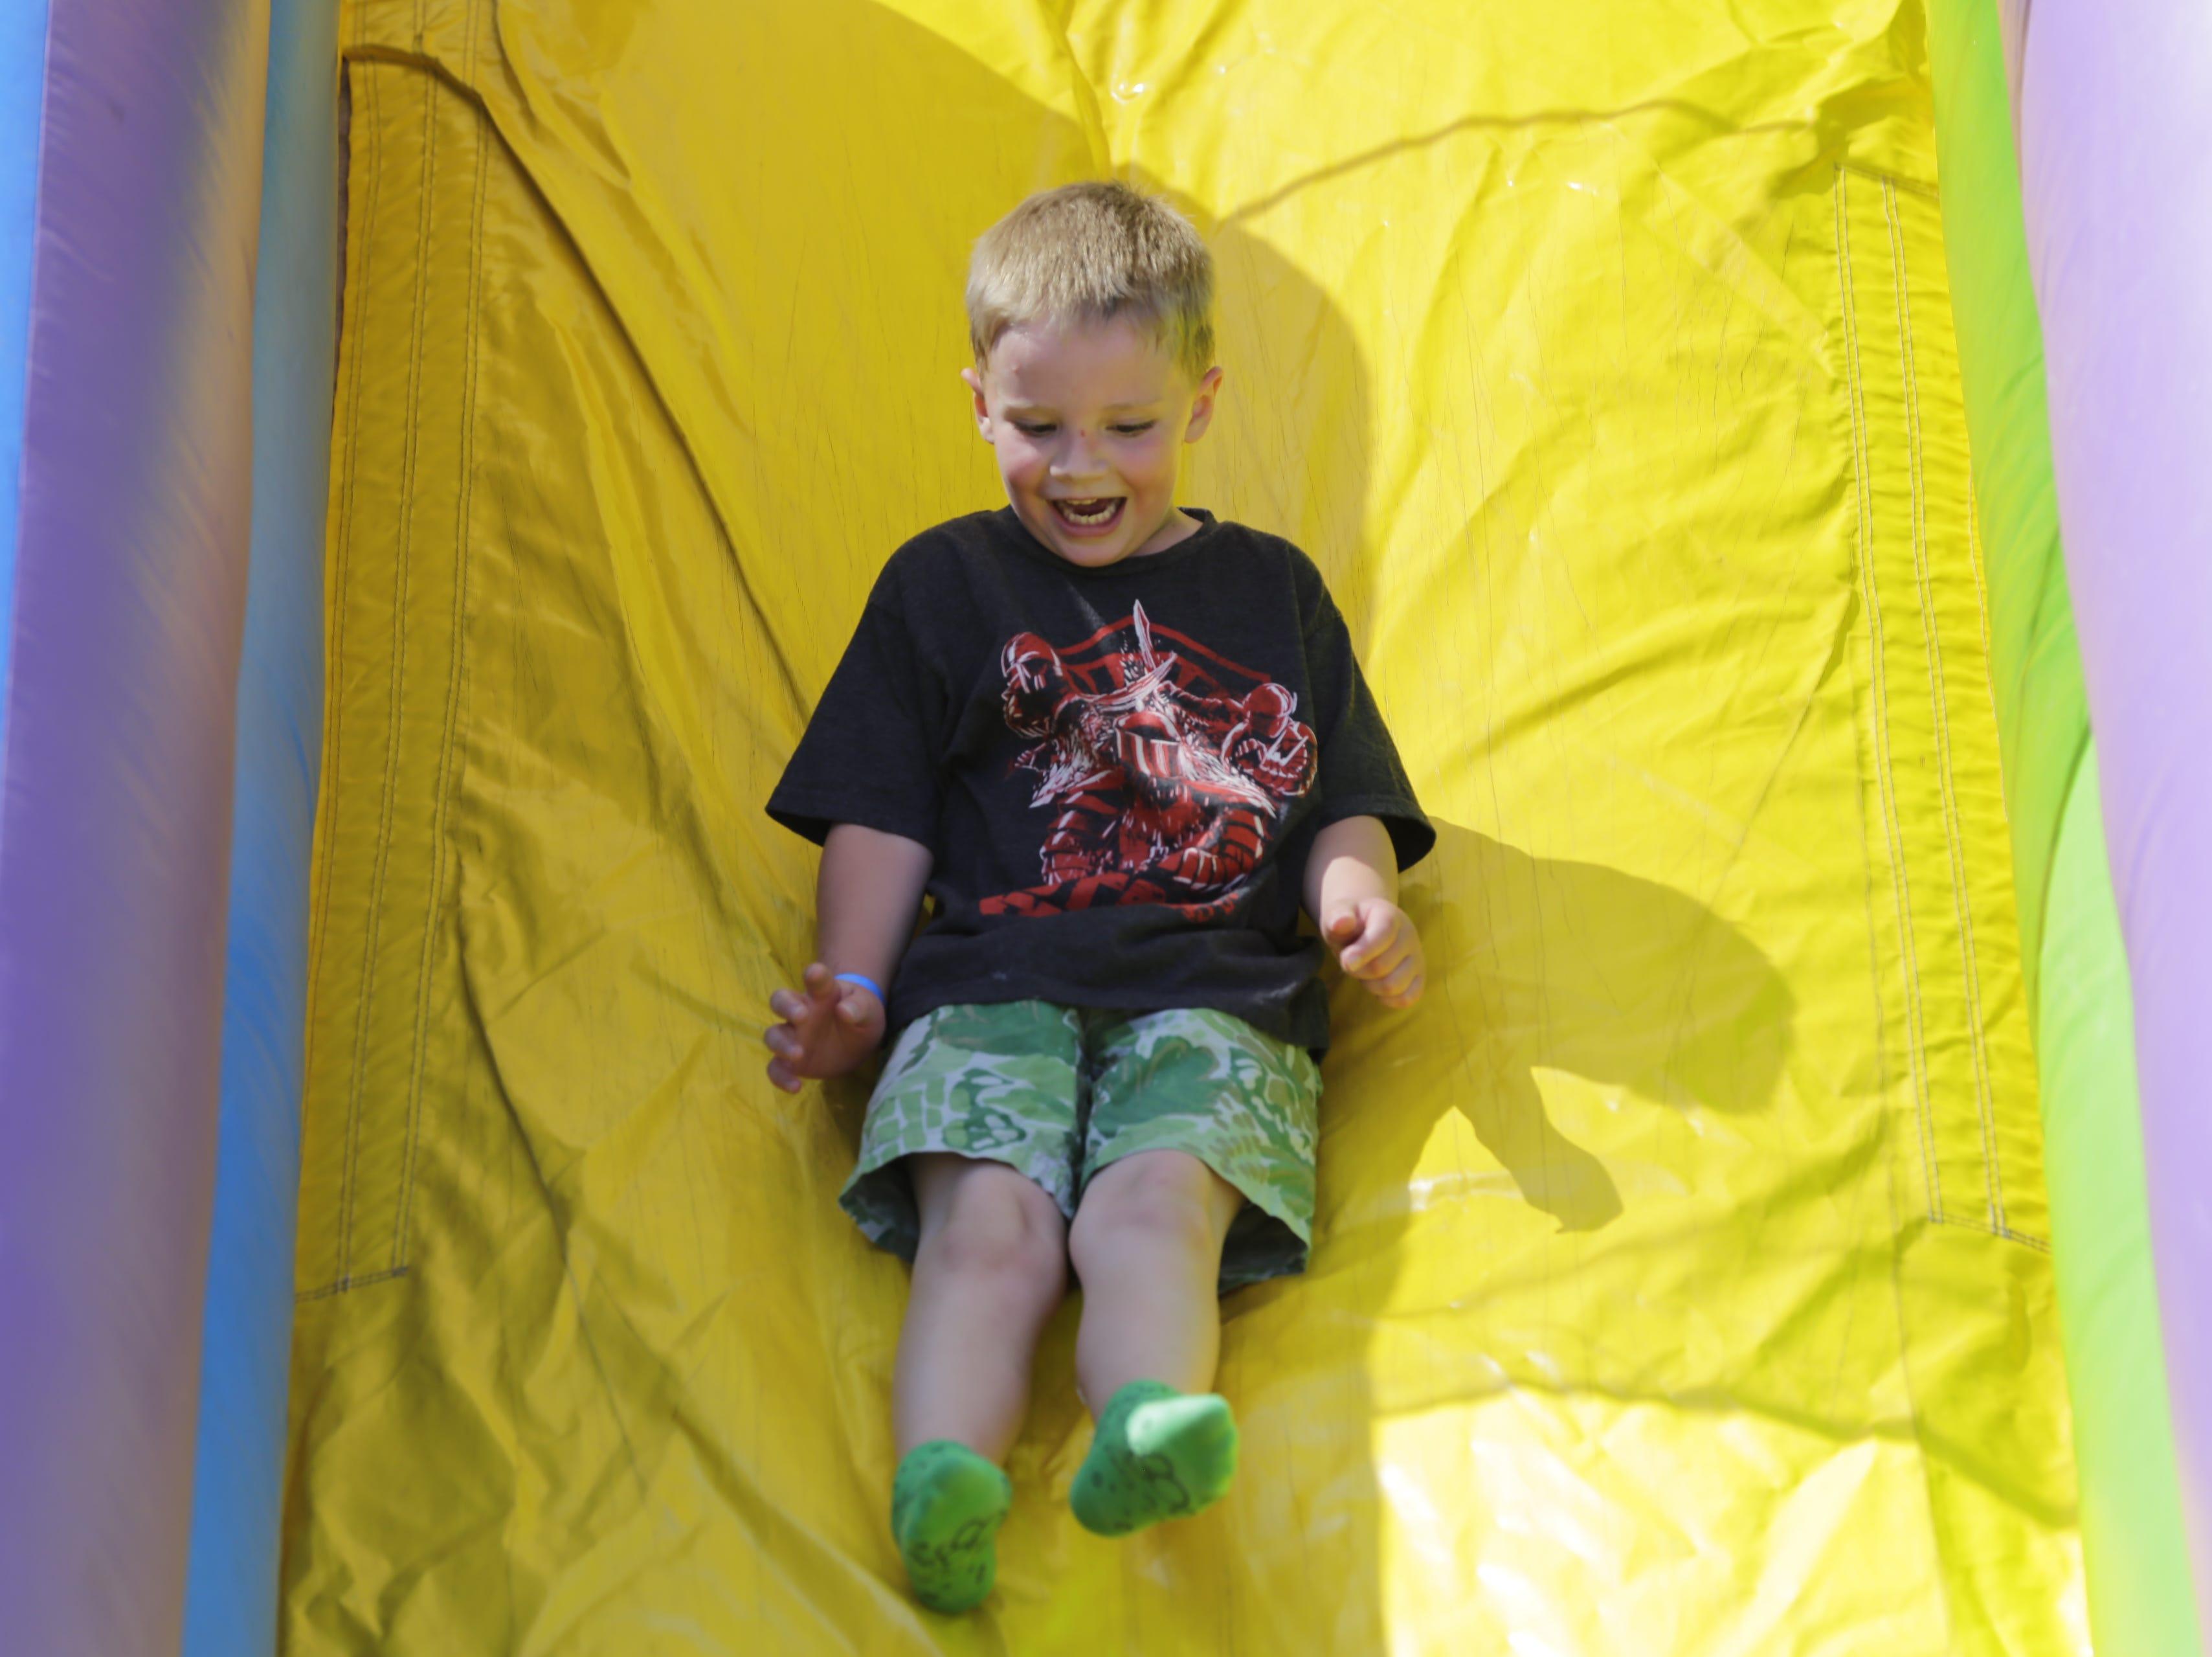 Aidan Kyriss, 6, of Marshfield slides down an inflatable slide at Hub City Days in downtown Marshfield Saturday, July 28, 2018.